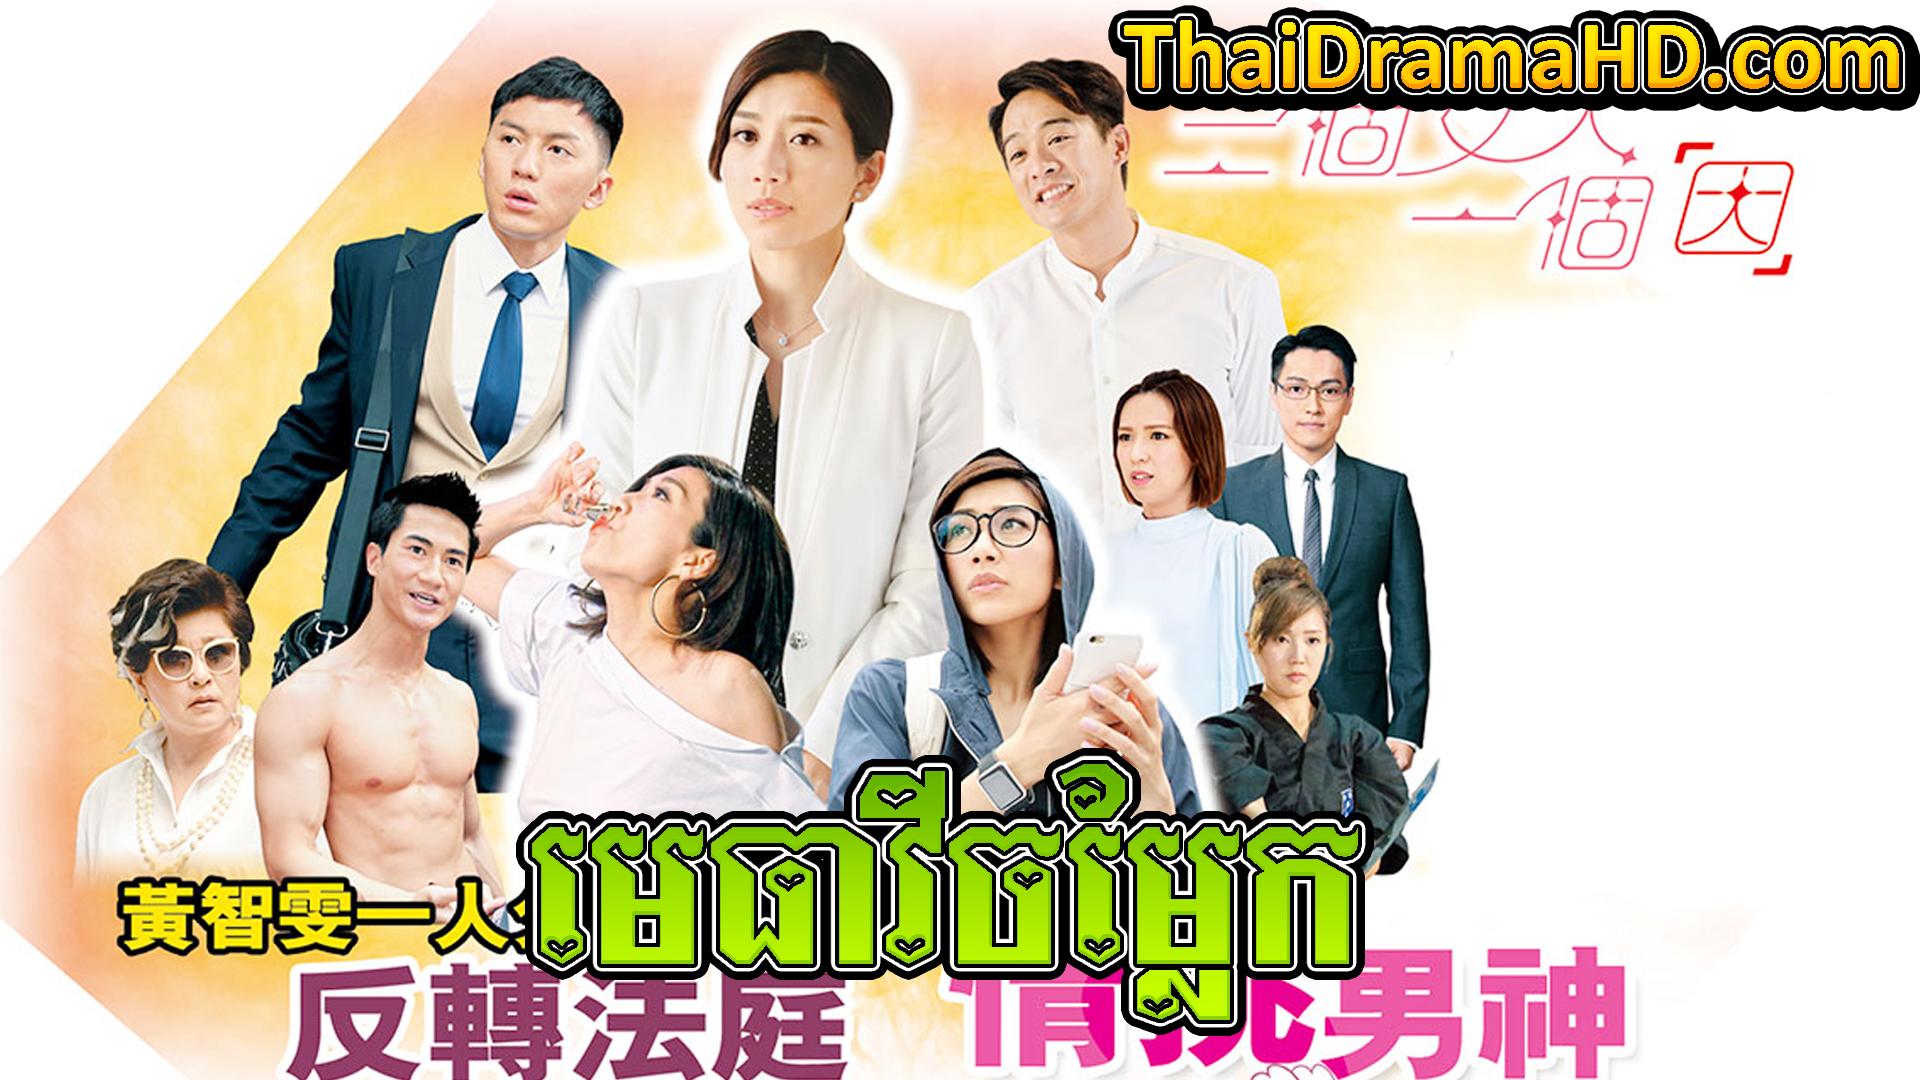 Metheavy Chamlek, Thai Drama, Thai Drama HD, Khmer Movie, Phumikhmer, Phumikhmer1, movie-khmer, video4khmer, khmotions, kolabkhmer, khmer drama, ksdrama, cookingtips, roscheat, khmertimeskh, khmerkomsan, phumi7, merlkon, film2us, movie2kh, sweetdrama, khmercitylove, khreplay, tvb cambodia drama, ckh7, srokthai, phumimedia, phumi8, khmer avenue, khmer search, Soyo, khmerfans